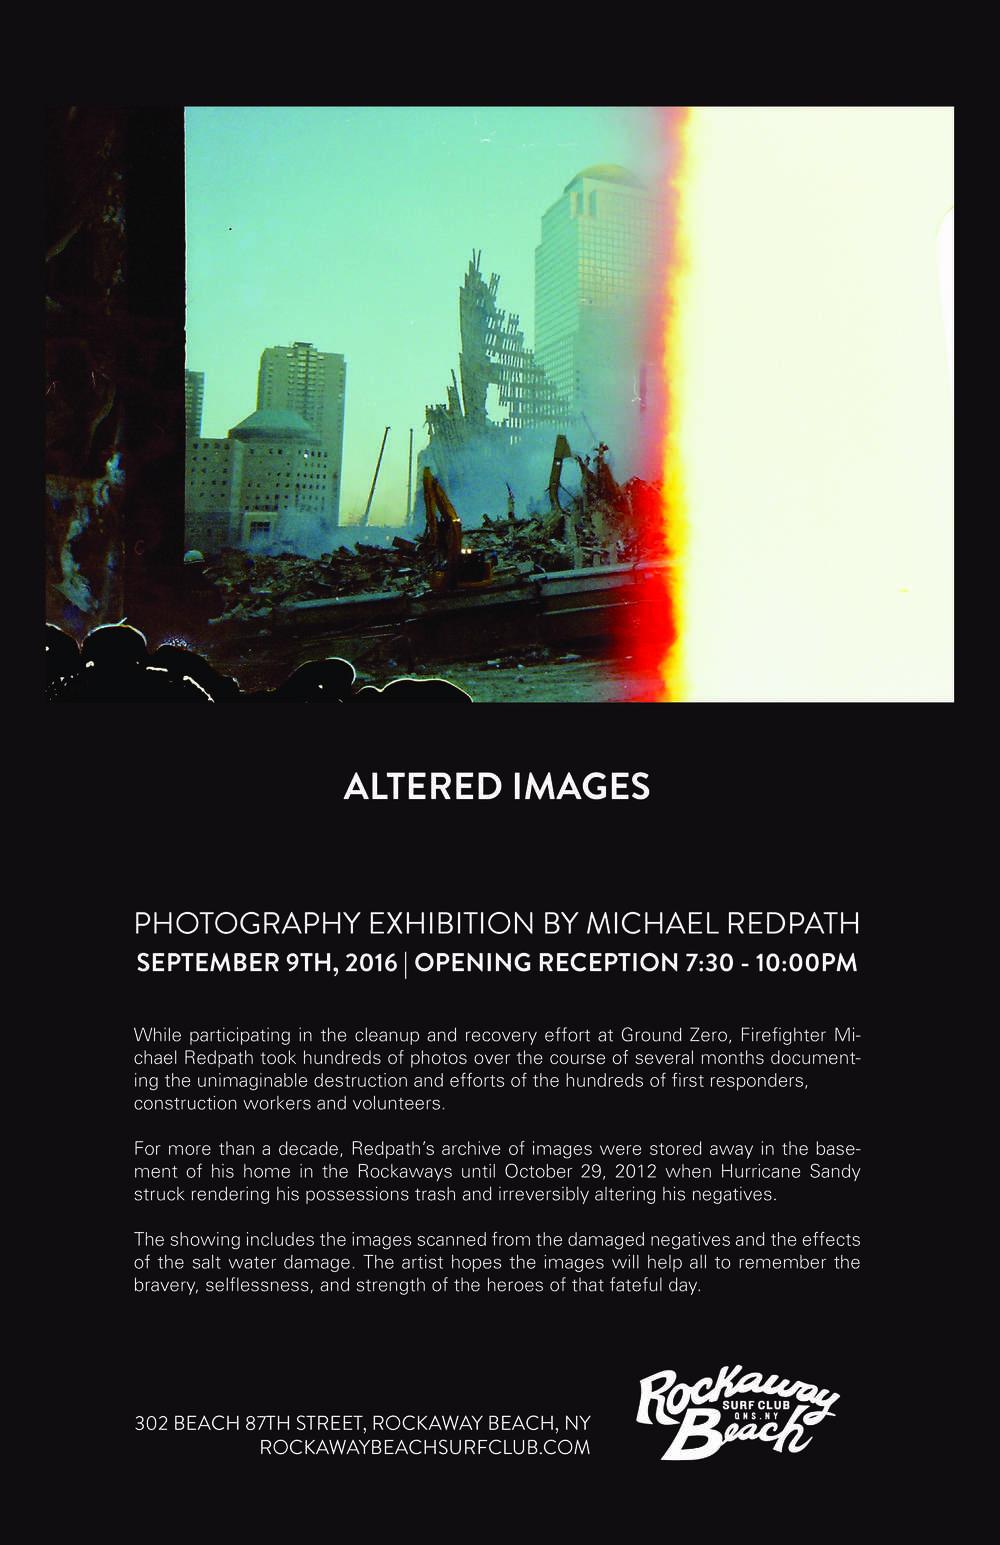 altered images michael redpath rockaway beach